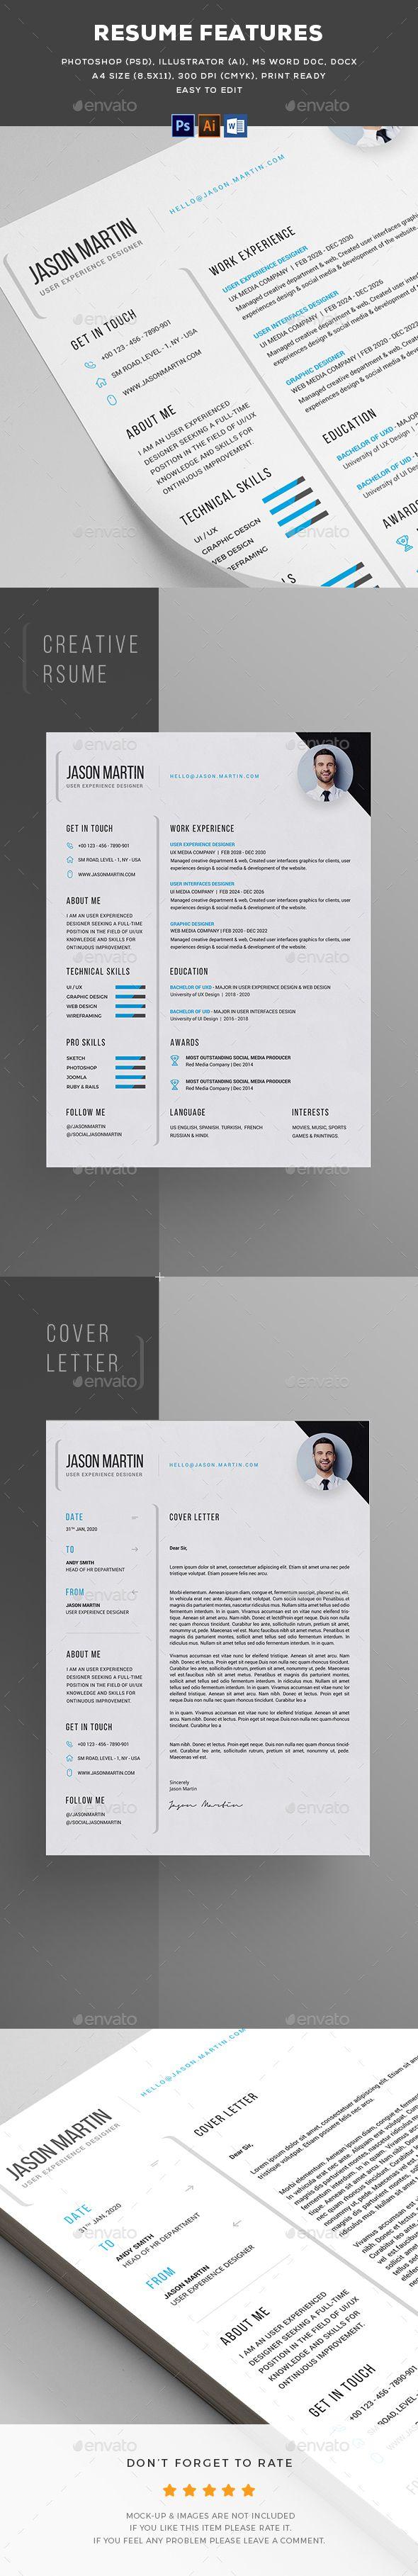 graphic design resume objective%0A Resume CV